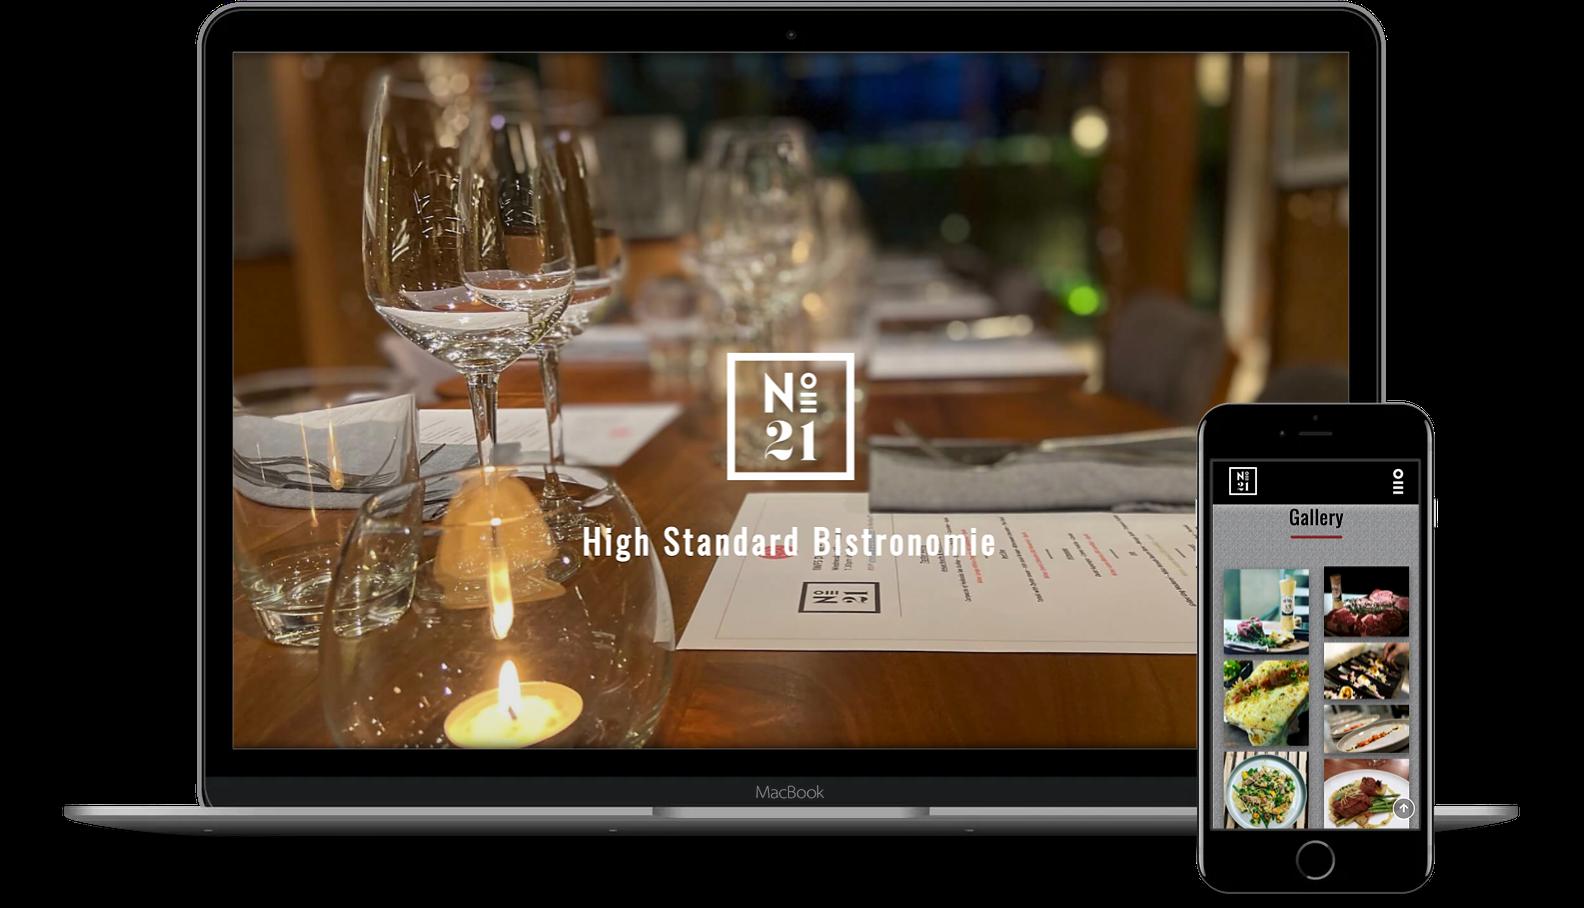 Full-Stack Web Developer - projects - N21 restaurant